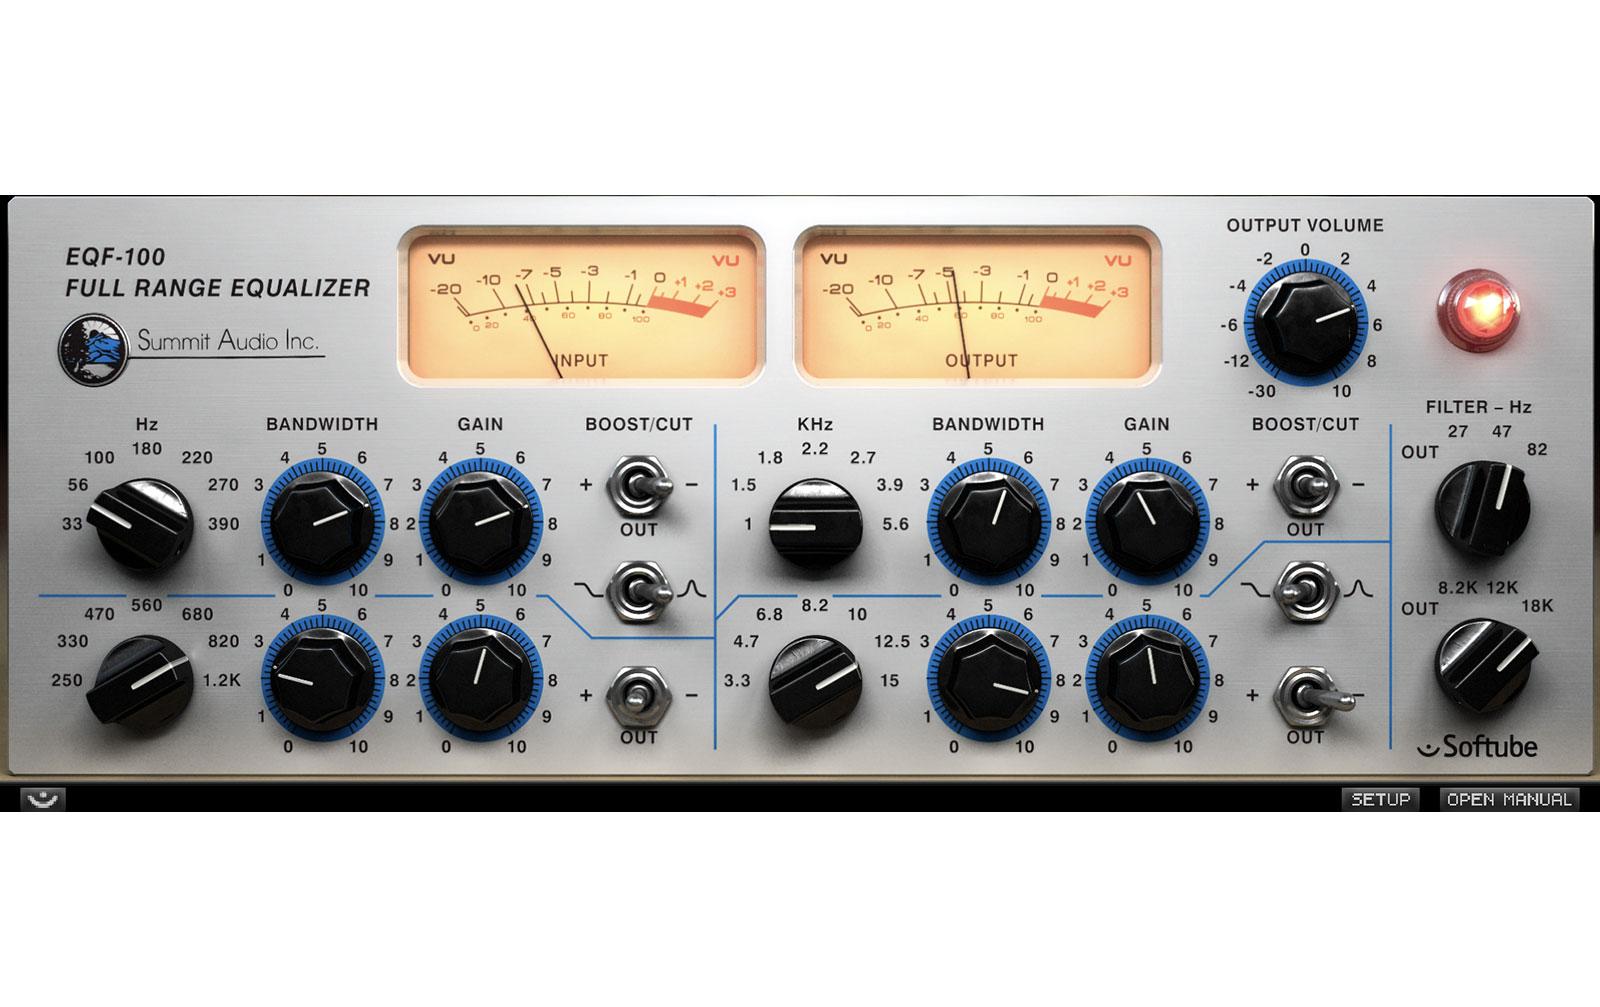 softube-summit-audio-eqf-100-esd-download-